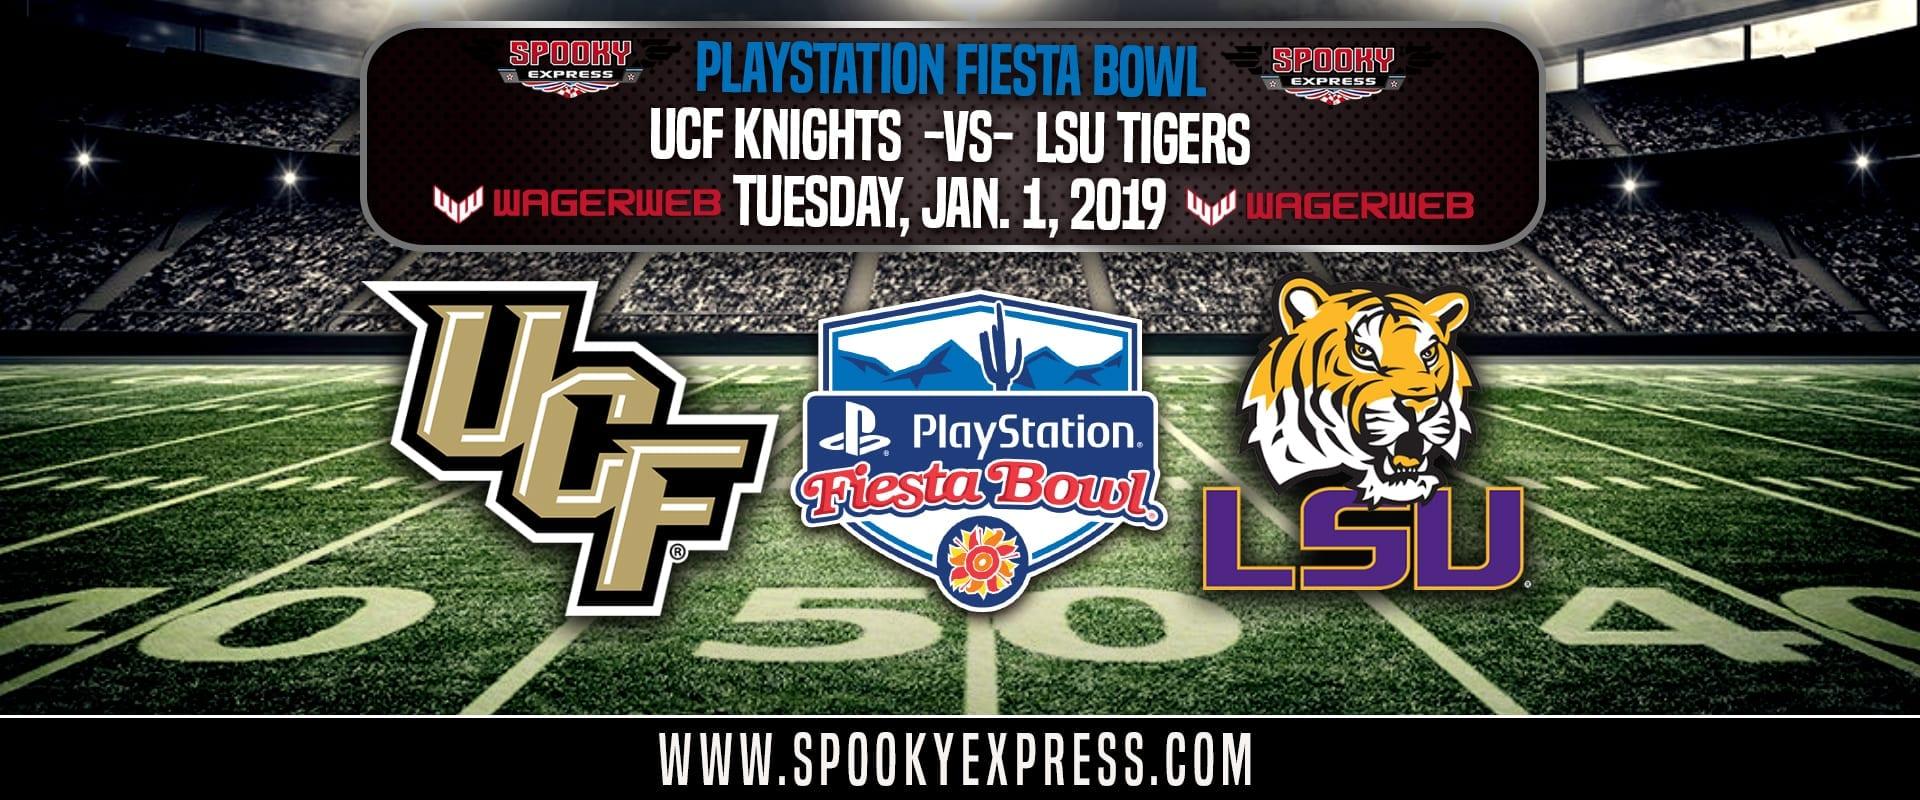 playstation fiesta bowl betting preview ucf knights vs lsu tigers